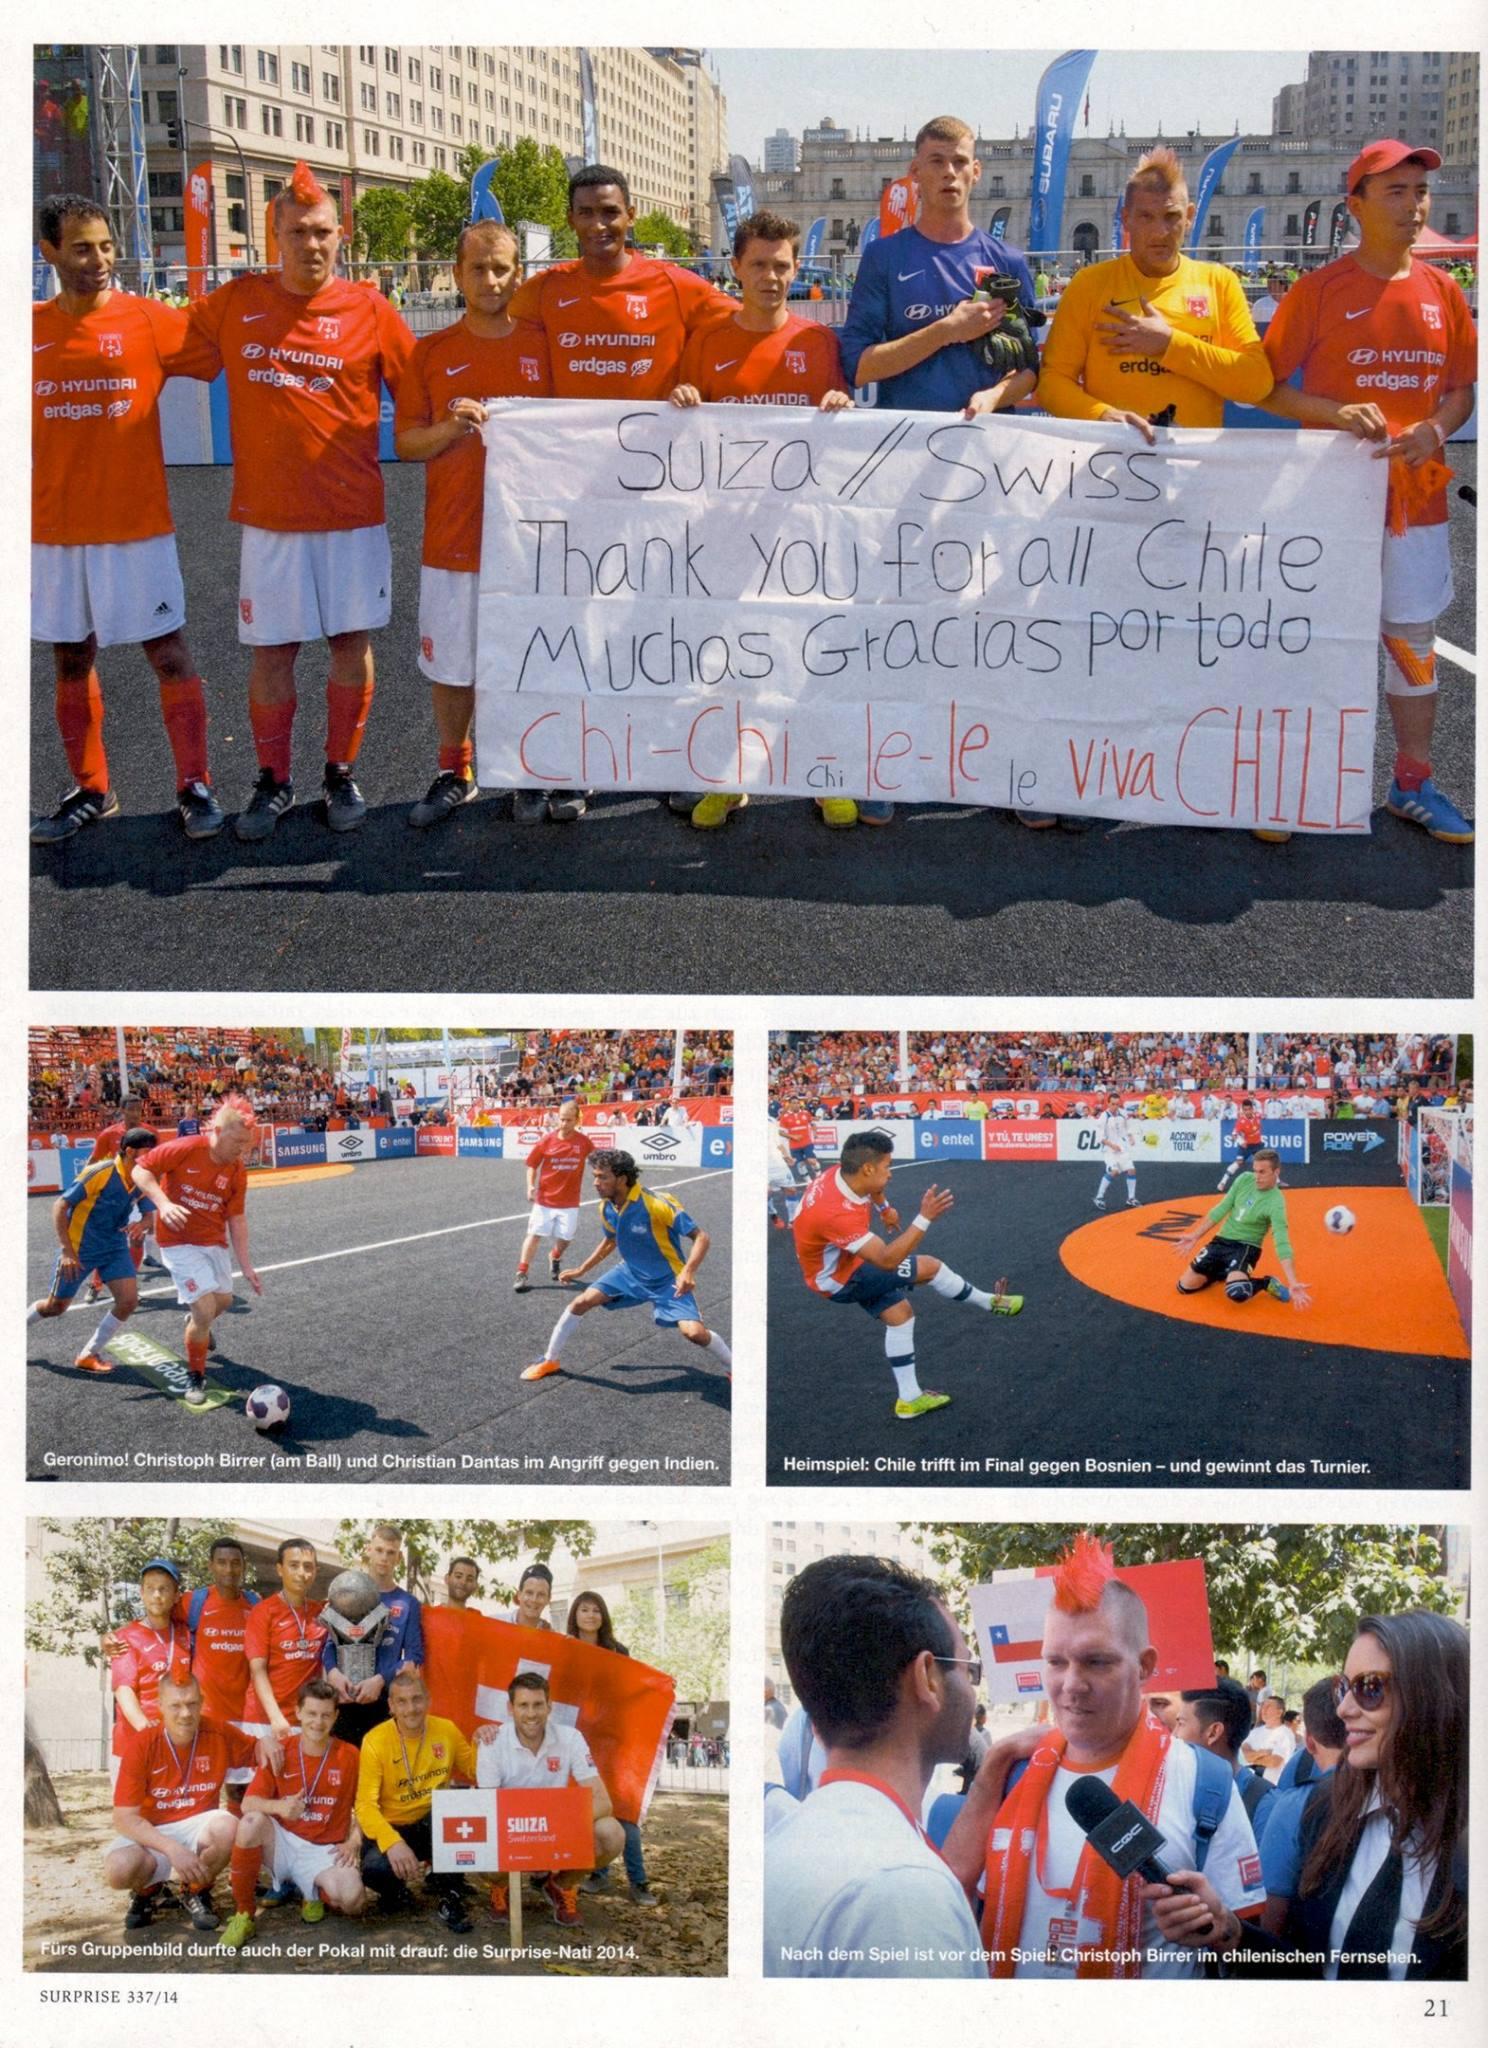 JUNI 2014  I  SURPRISE STRASSENMAGAZIN  I  NR. 337  I  HOMELESS WORLD CUP CHILE